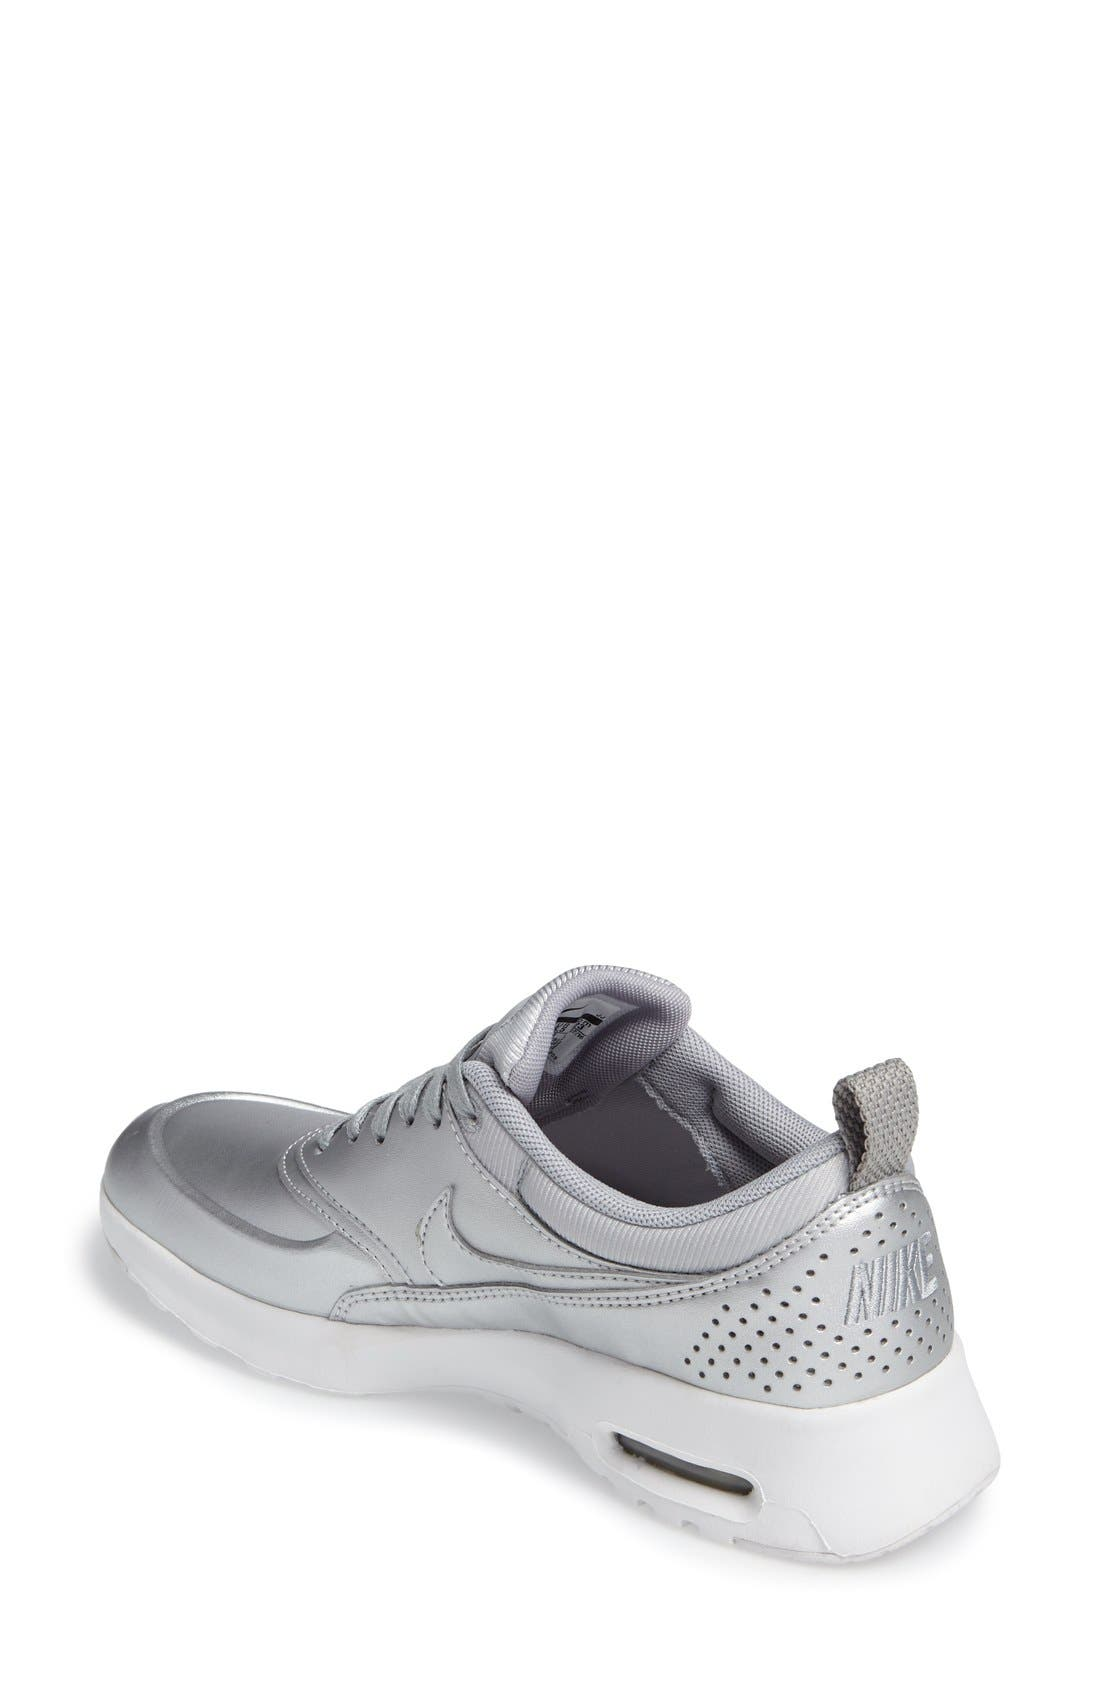 Alternate Image 2  - Nike 'Air Max Thea SE' Sneaker (Women)